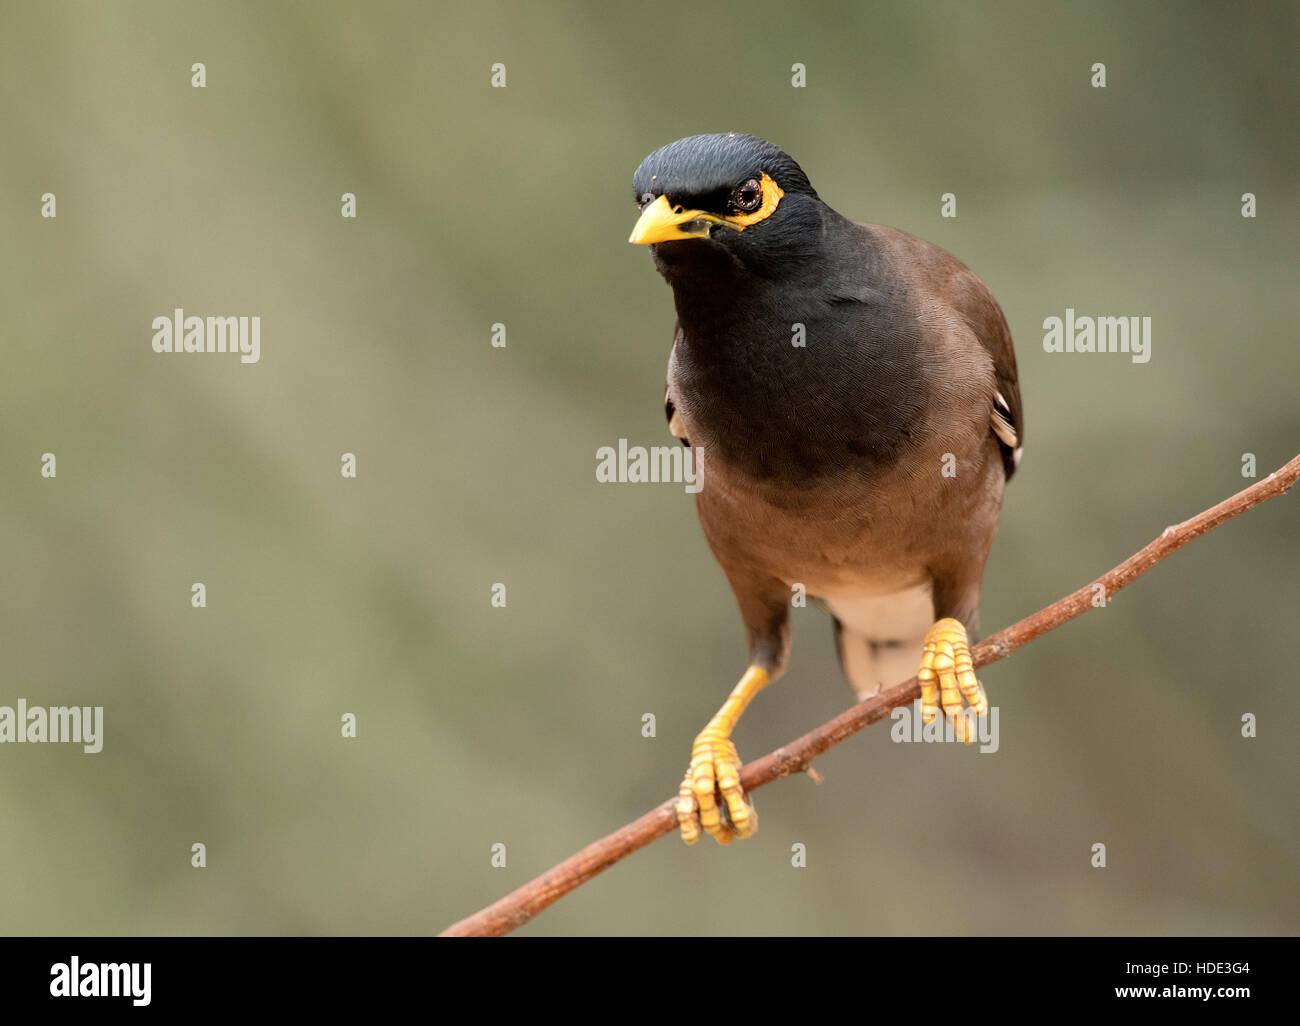 The image of  Common myna (Acridotheres tristis) in Daroji wildlife sanctuary, India - Stock Image